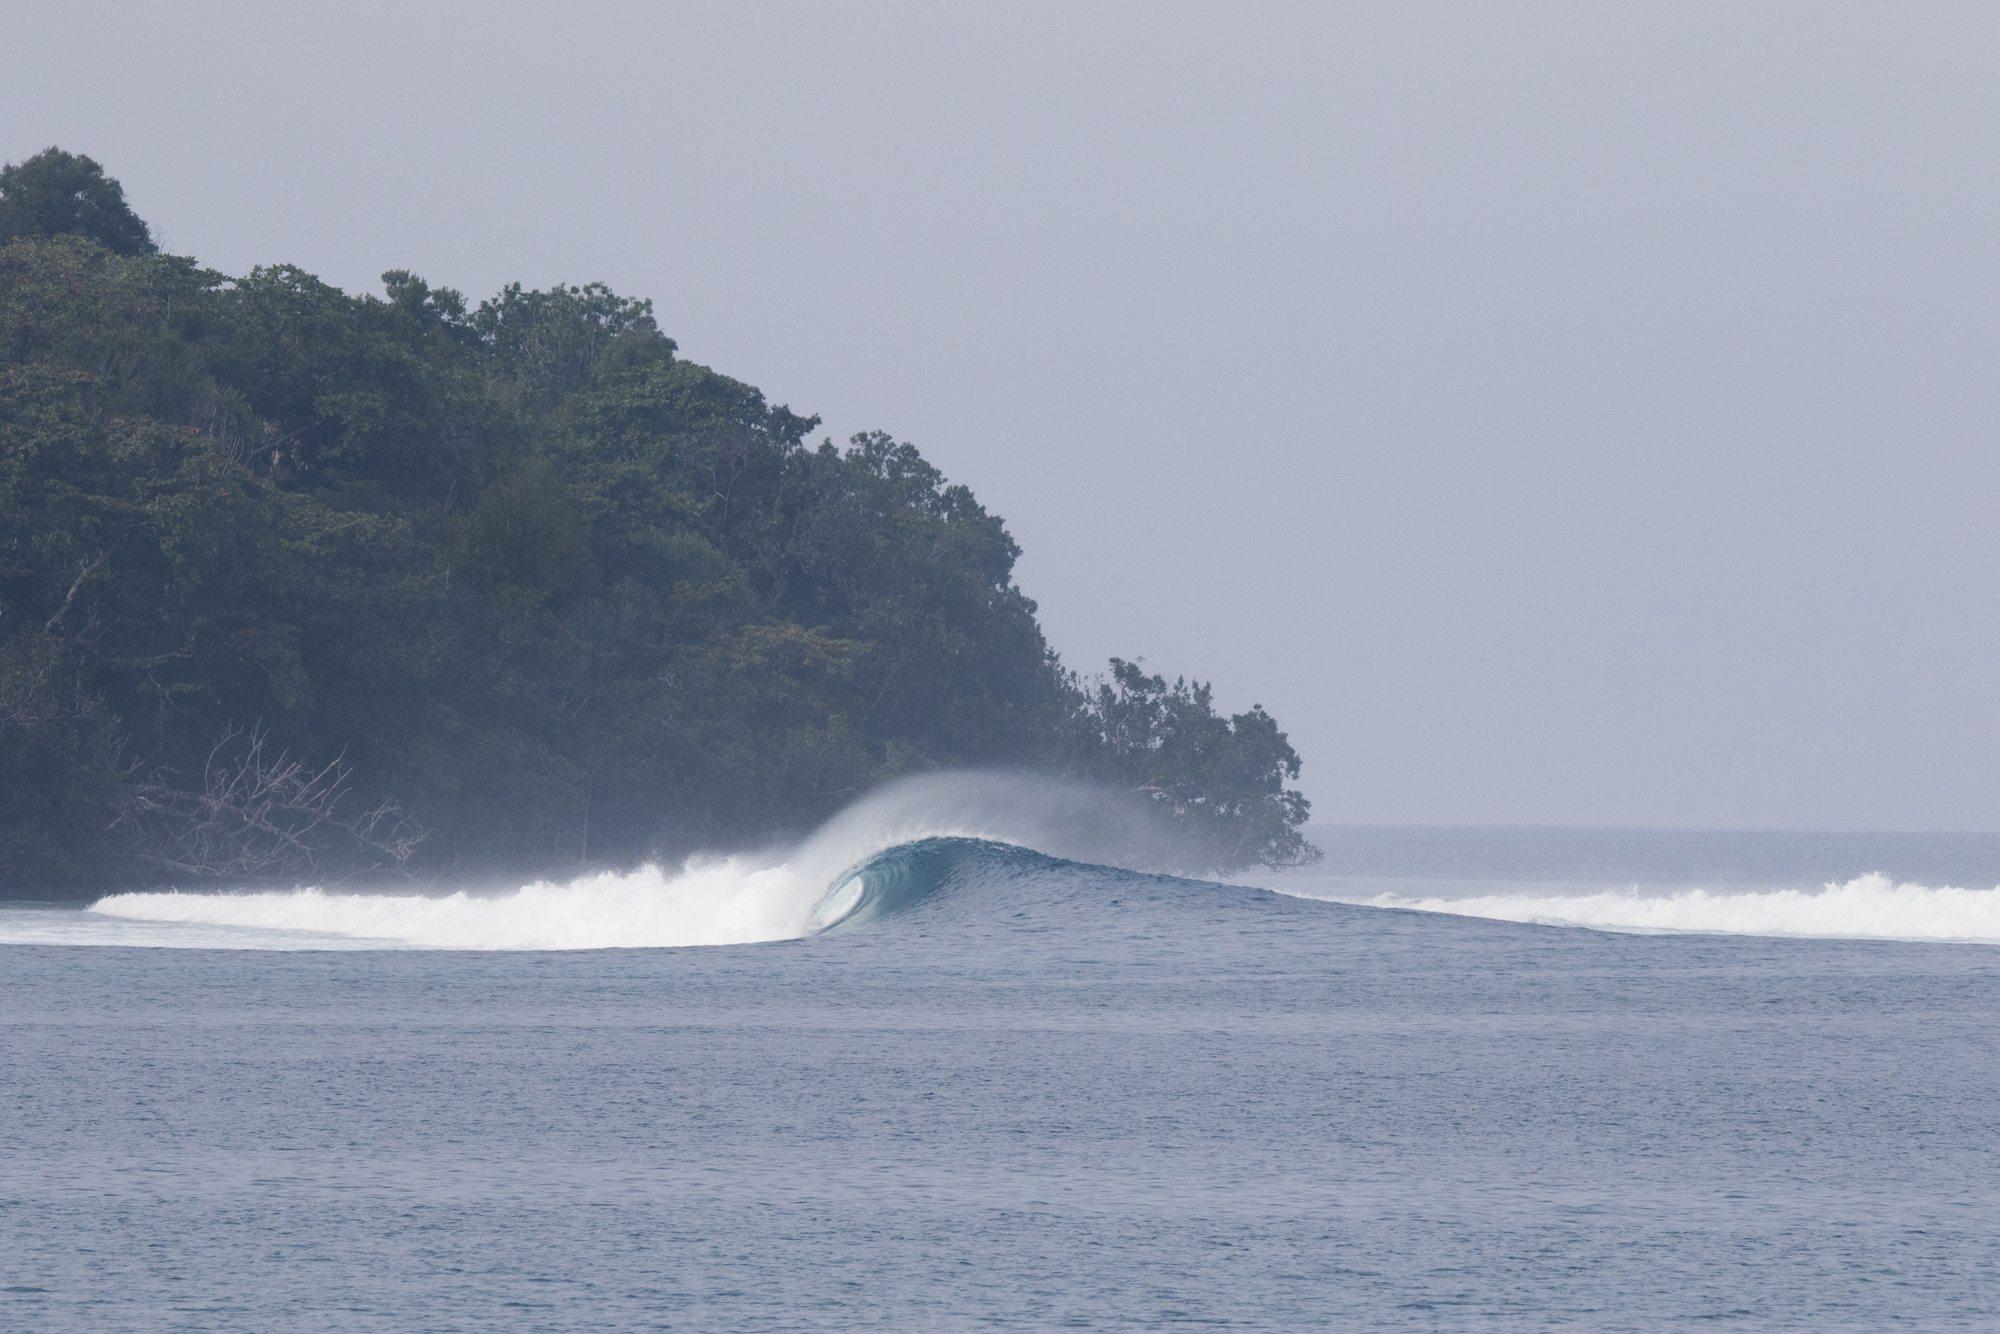 Clarets / Lolok Point / Bay of Plenty Lefts 9